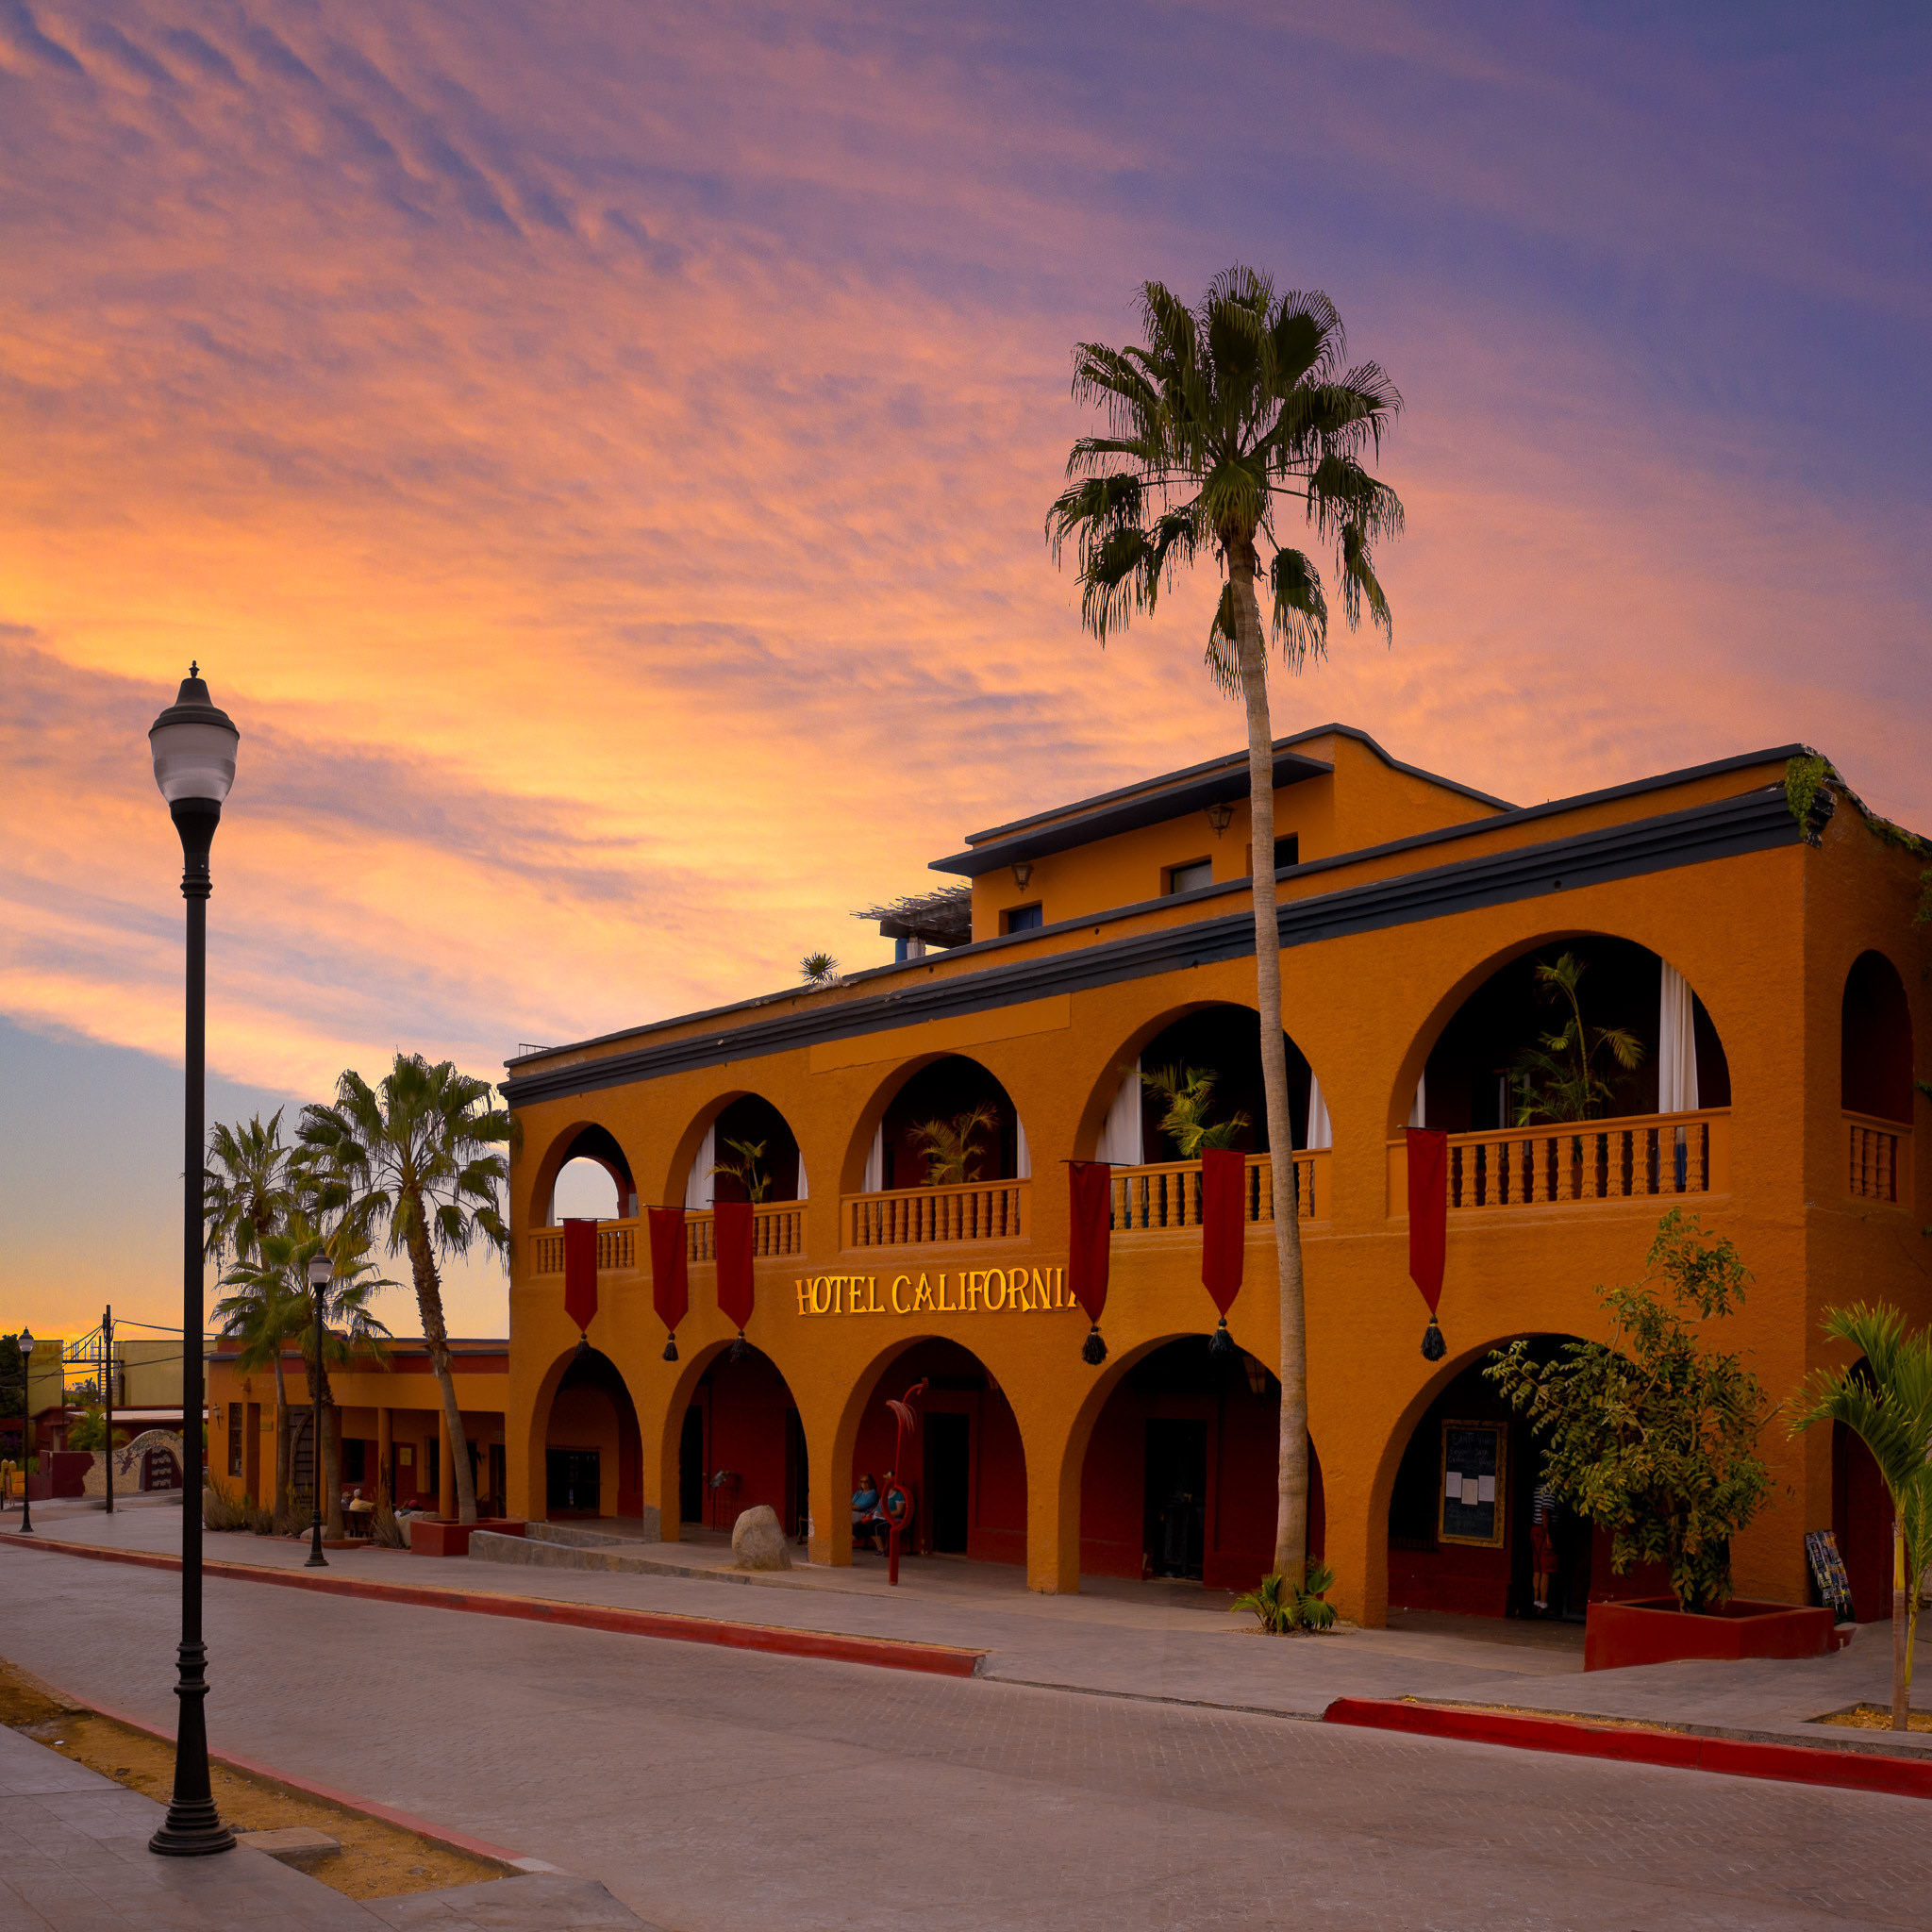 Hotel de fachada naranja situado en Baja California